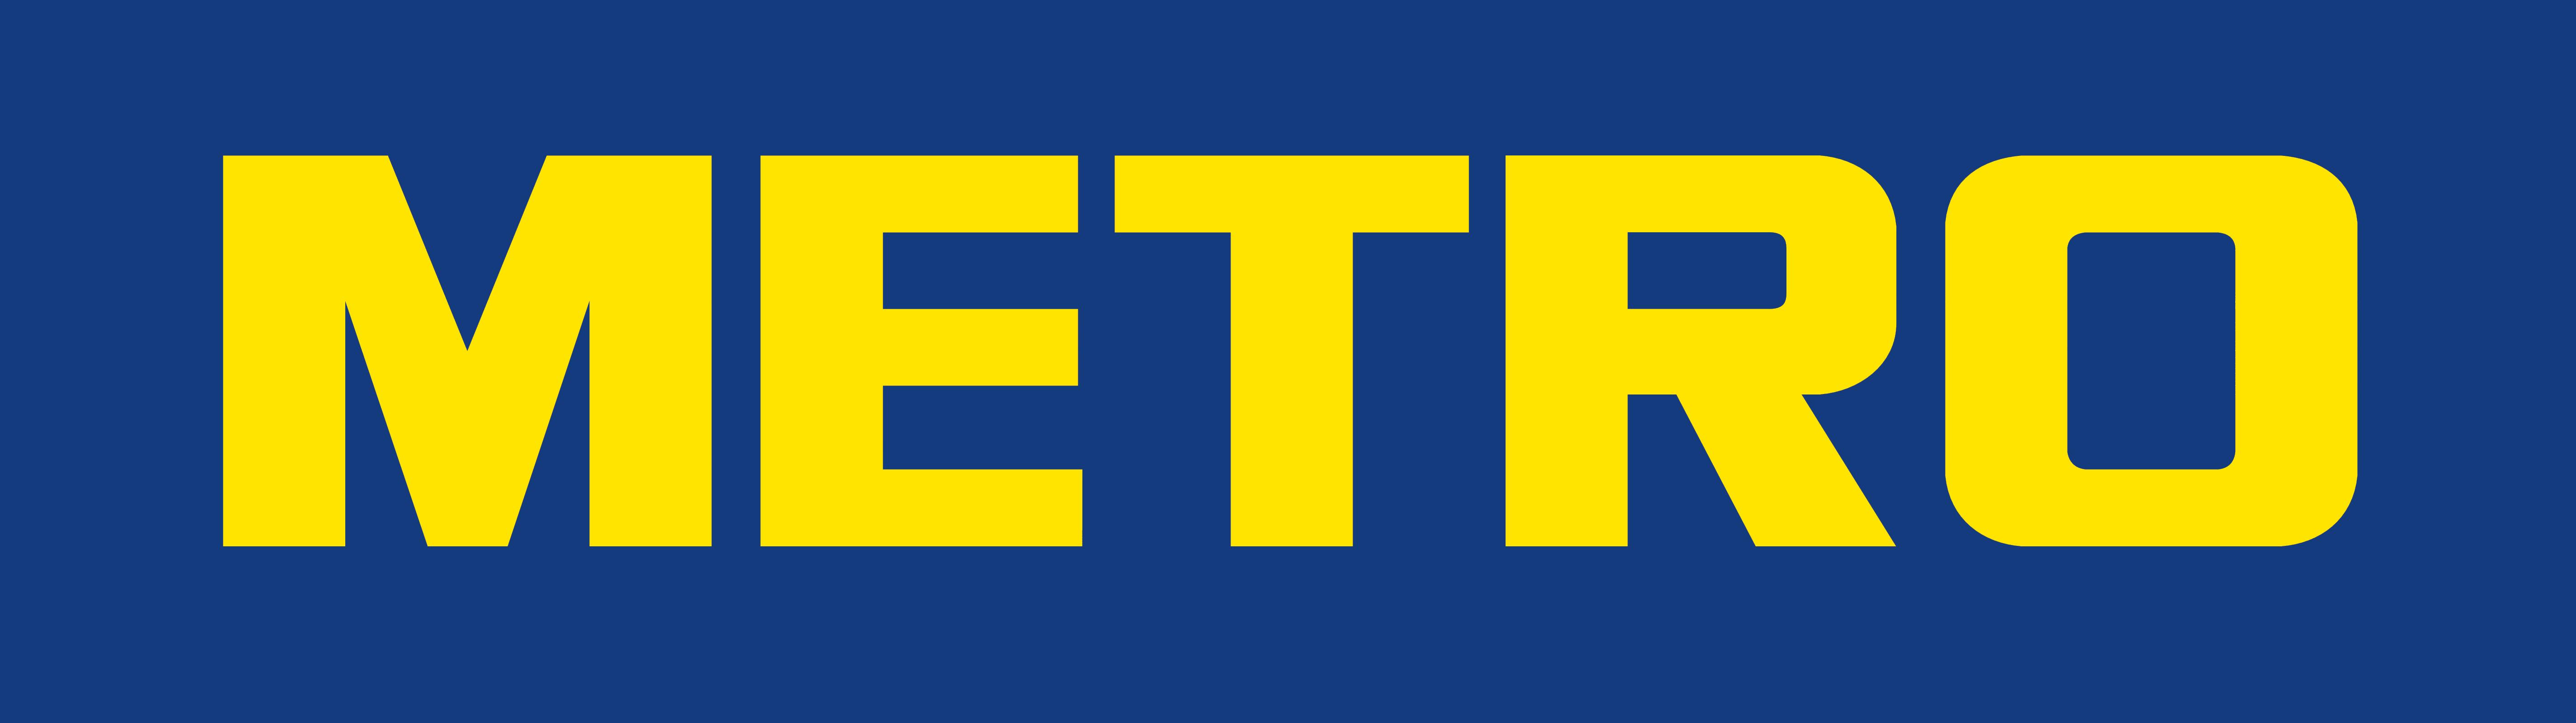 Metro Cash and Carry Logo Wallpaper